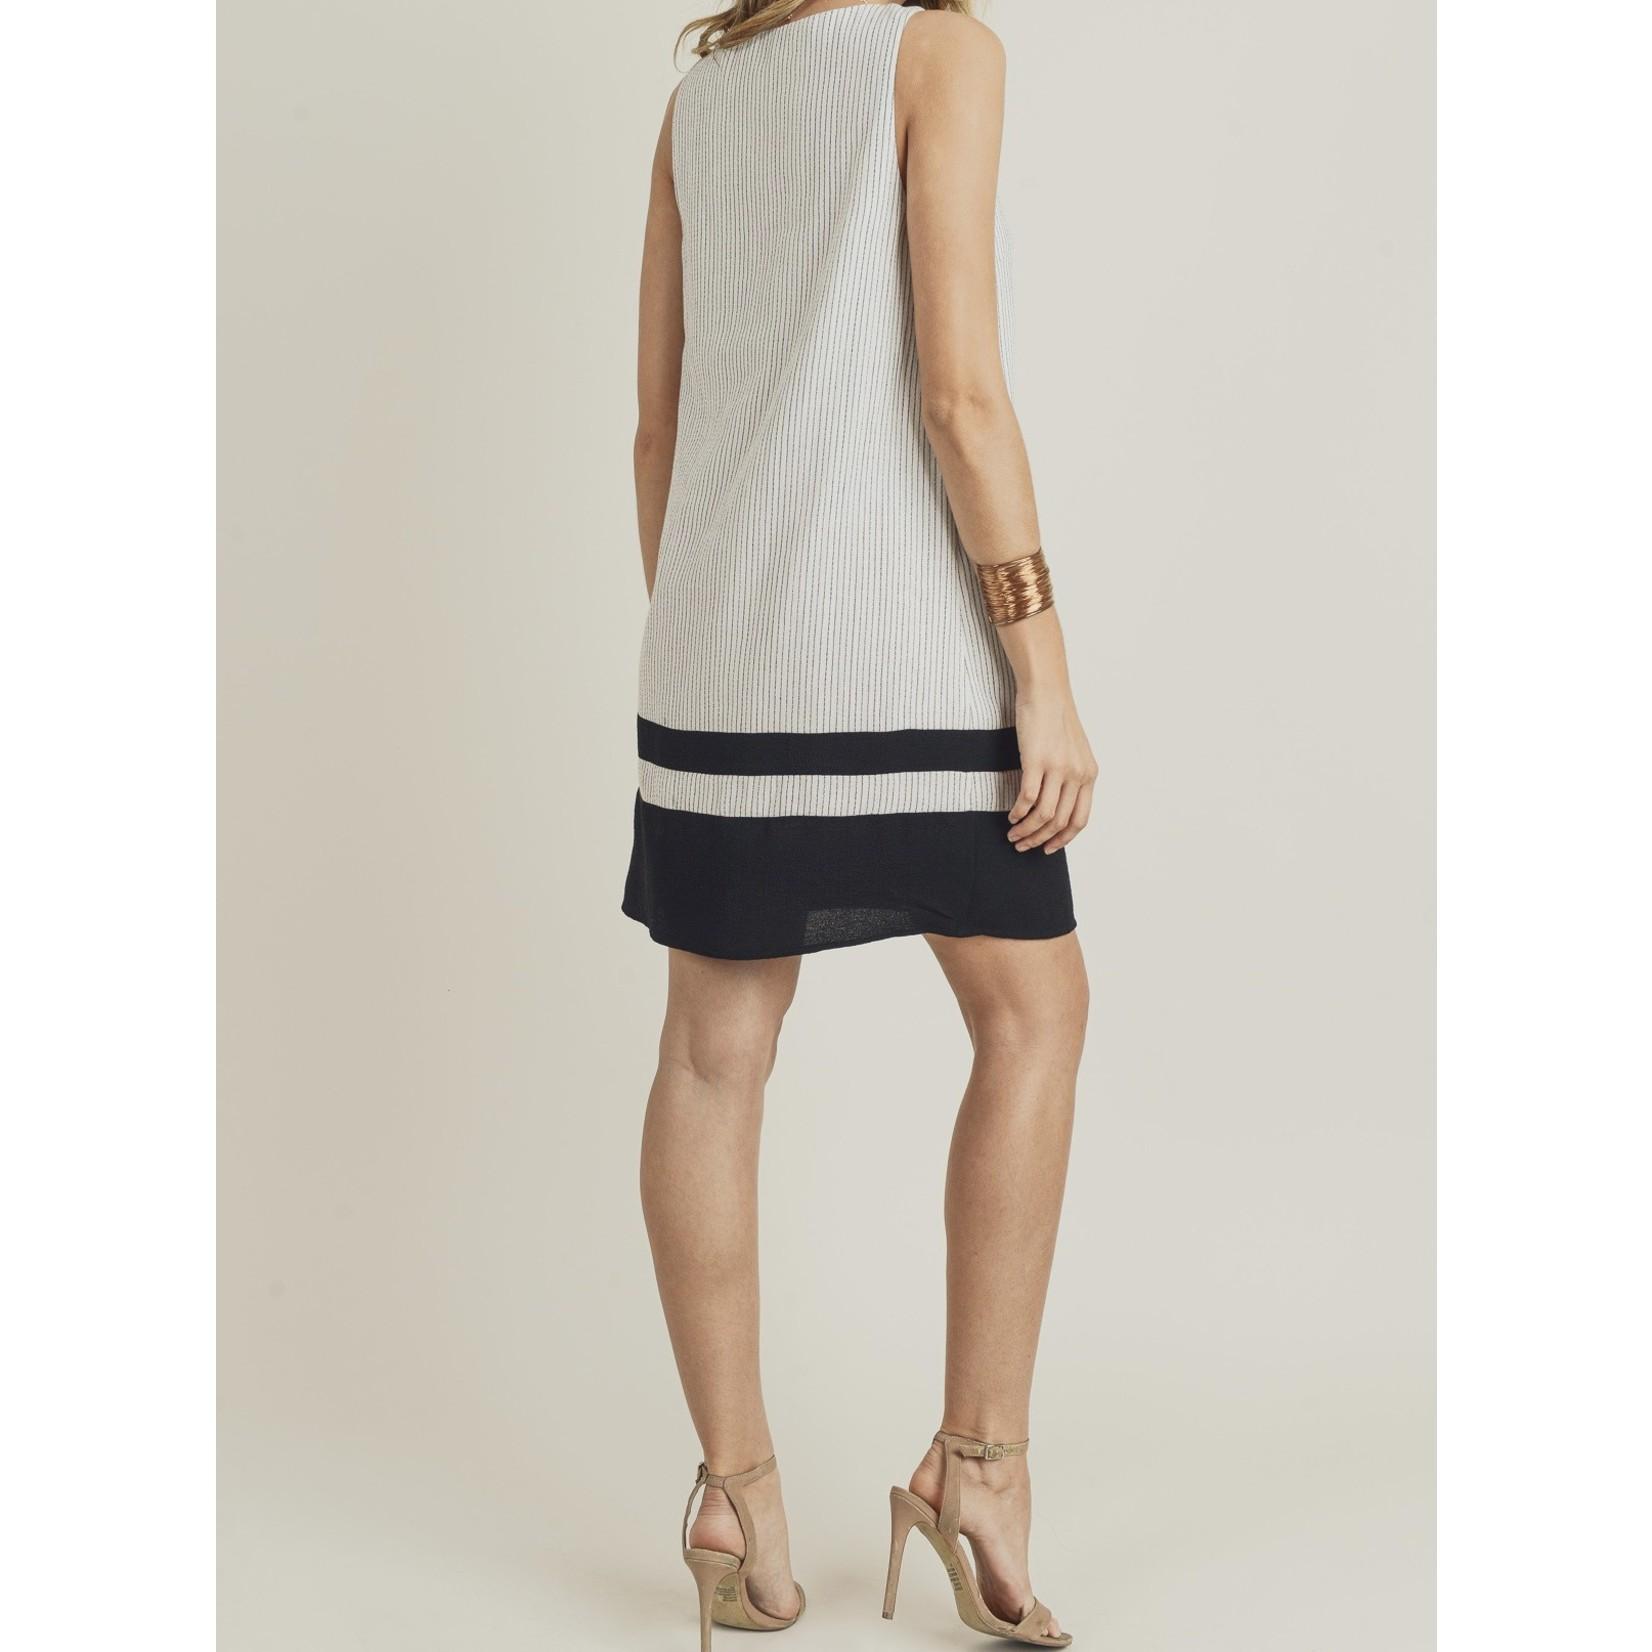 Doe & Rae Dress: Black Stripe Woven Color Block